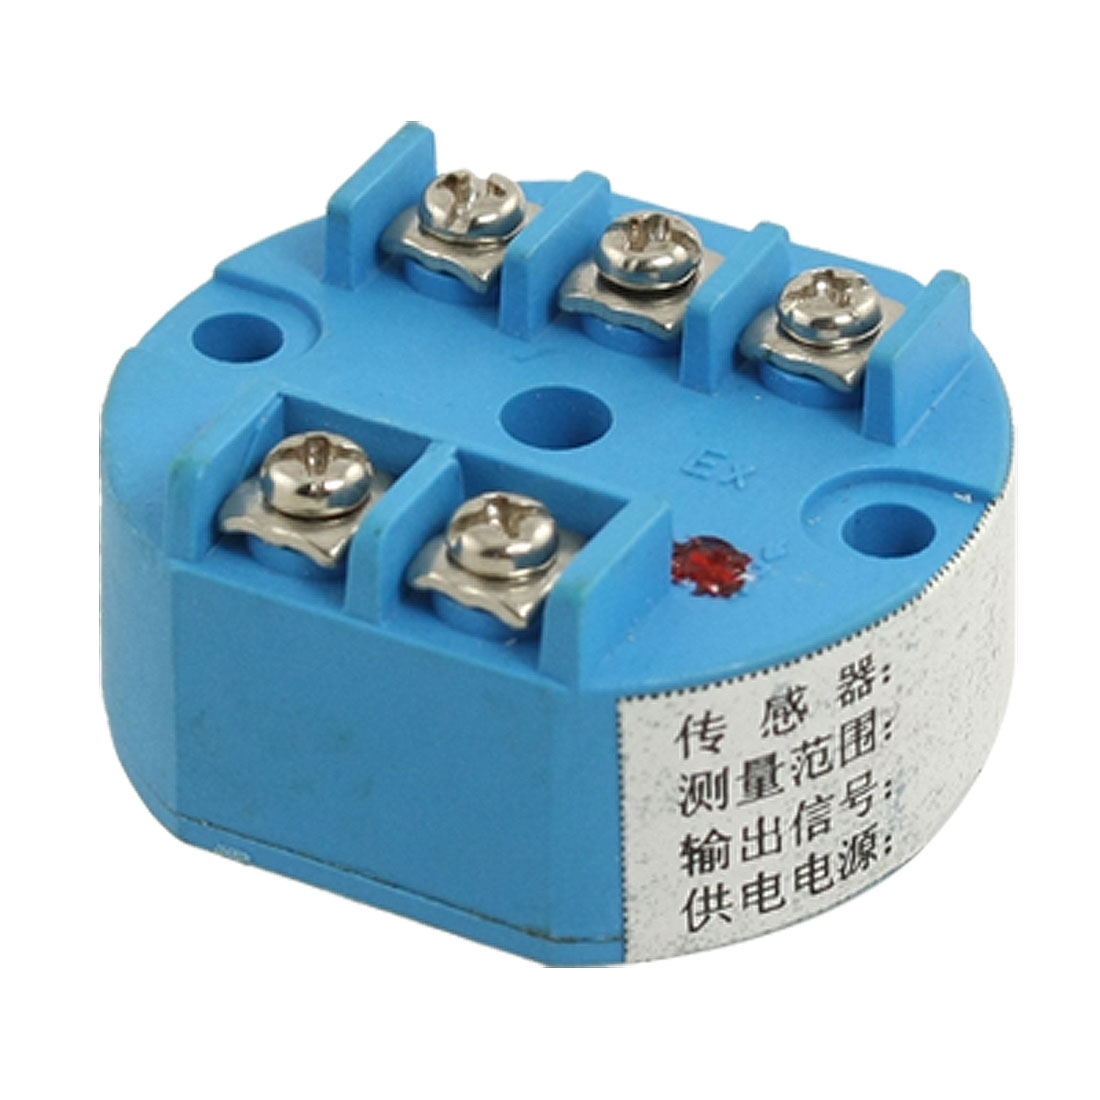 PT100 Temperature Sensor Transmitter 0-100C 4-20mA Output